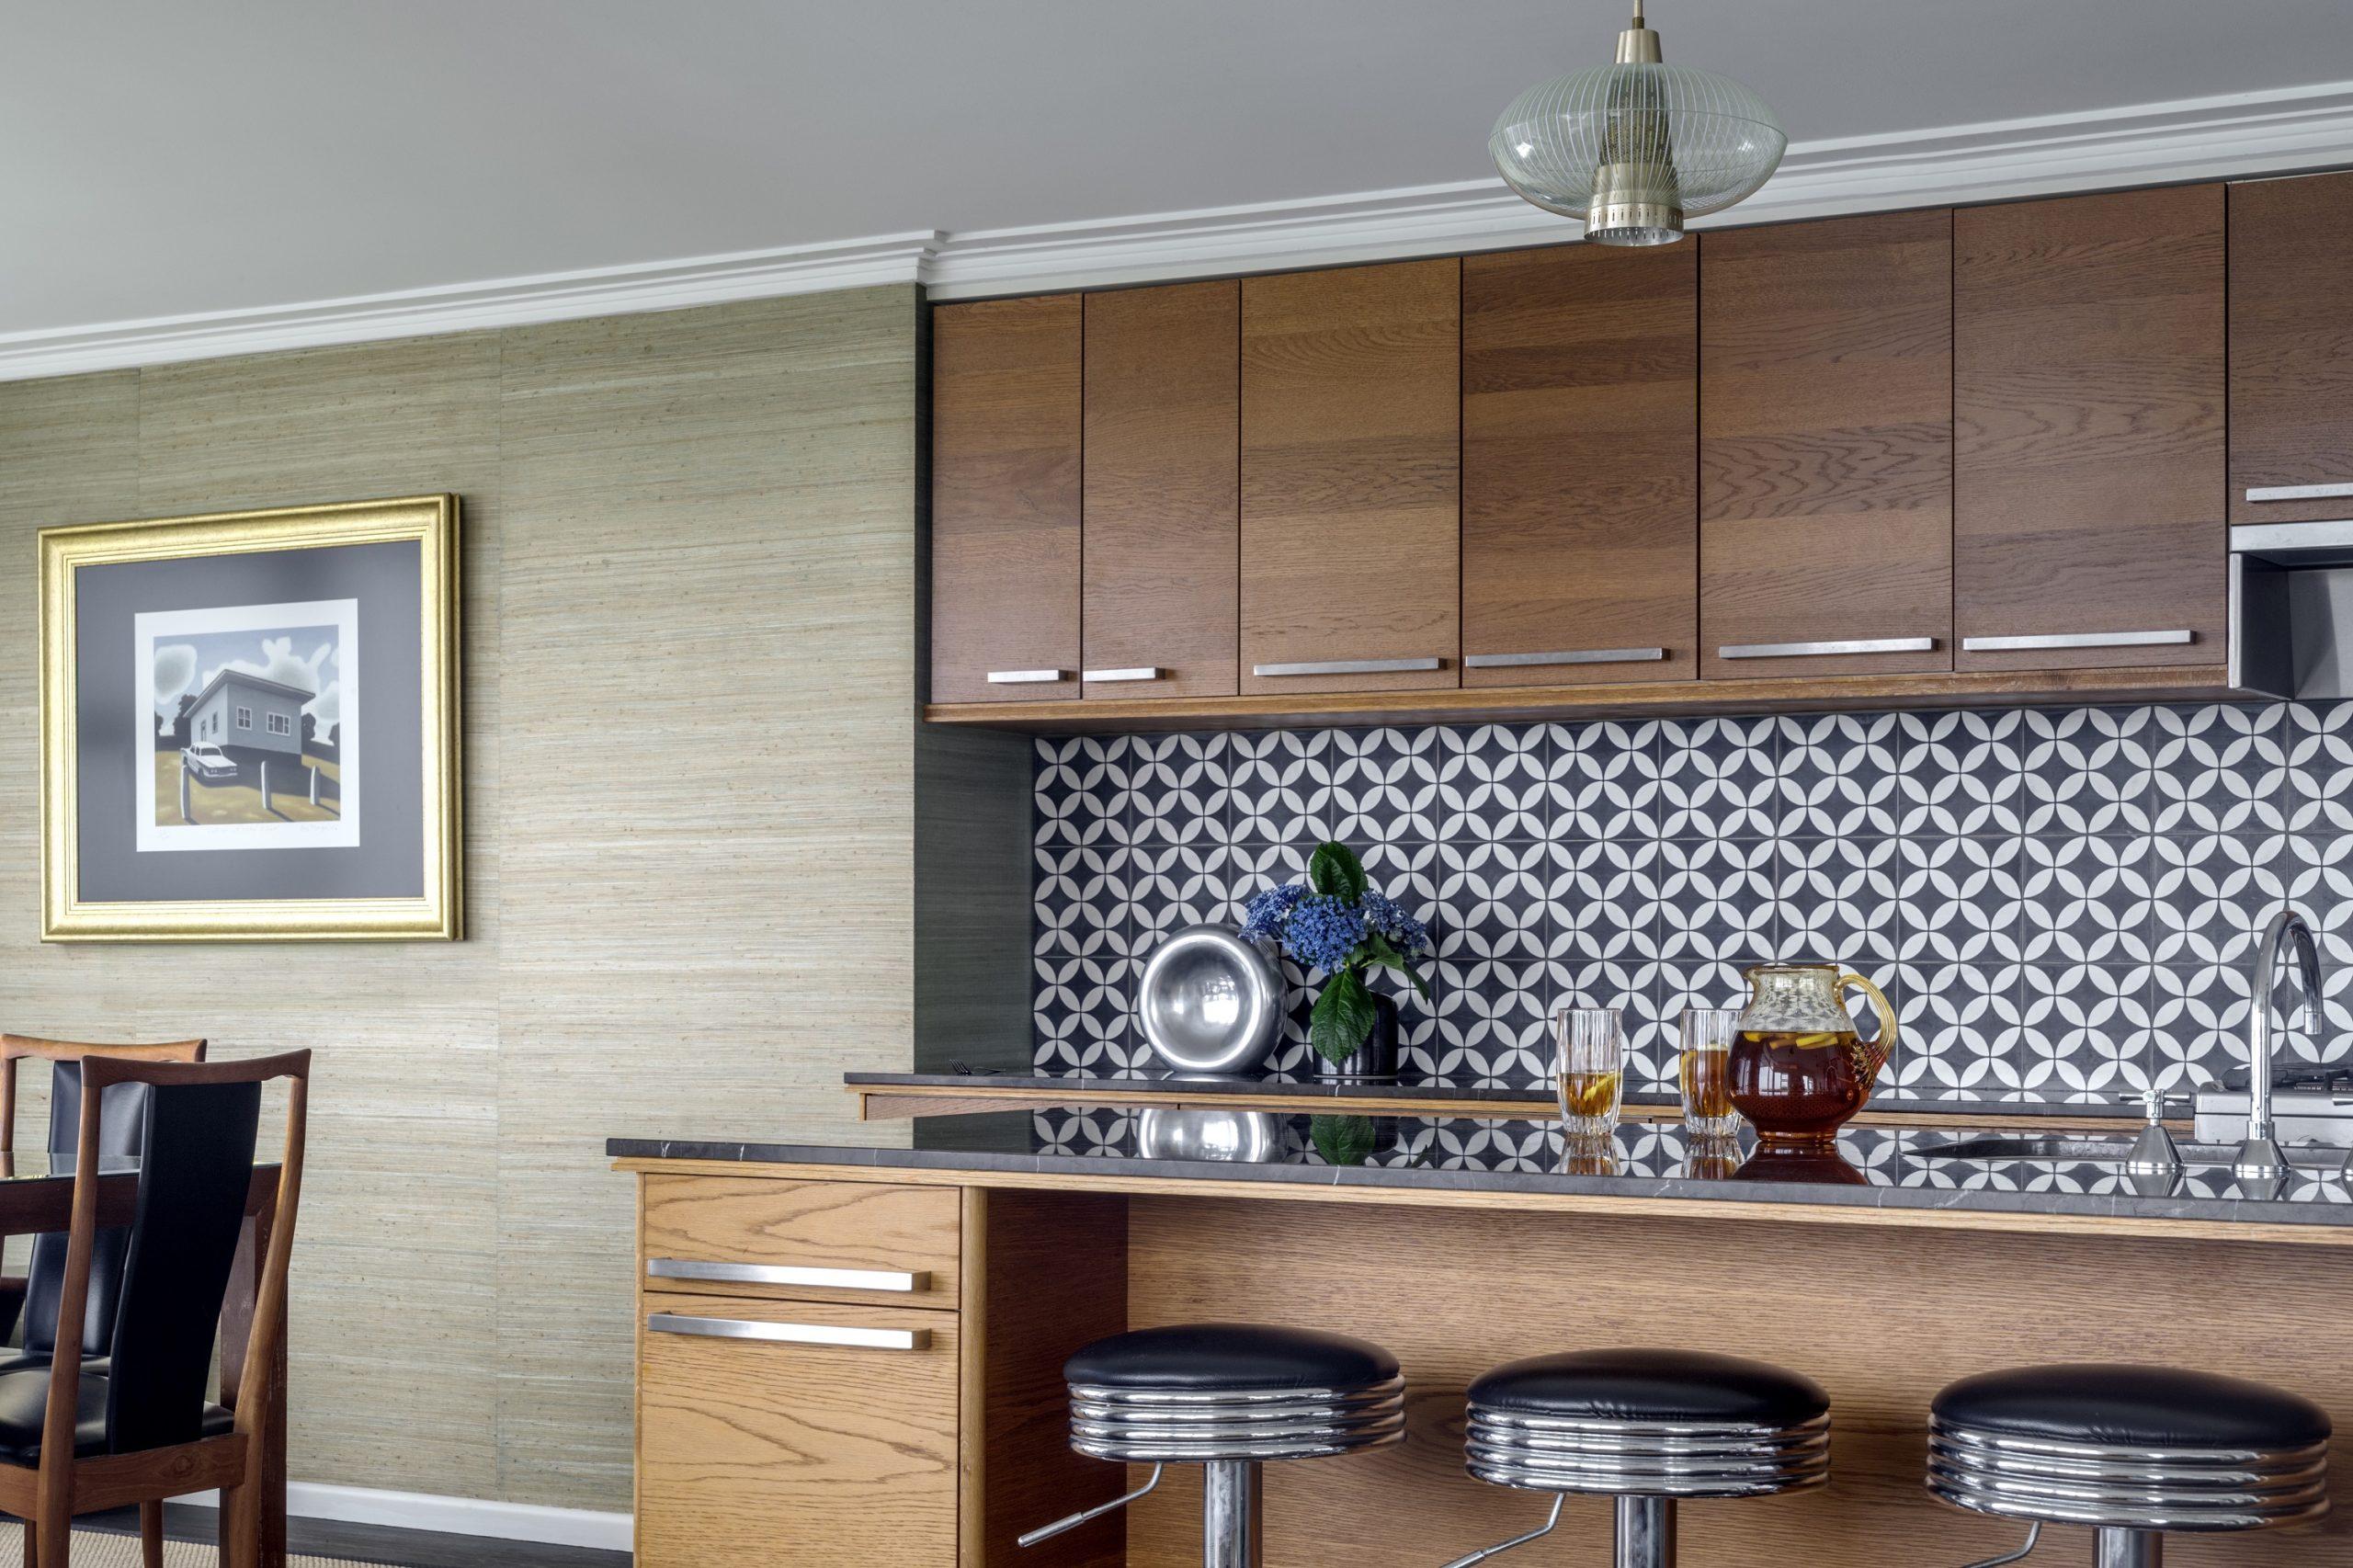 Retro-Interior-Design-1970s-Kitchen-Renovation-Kiama-Michael-Bell-Architects-Sydney